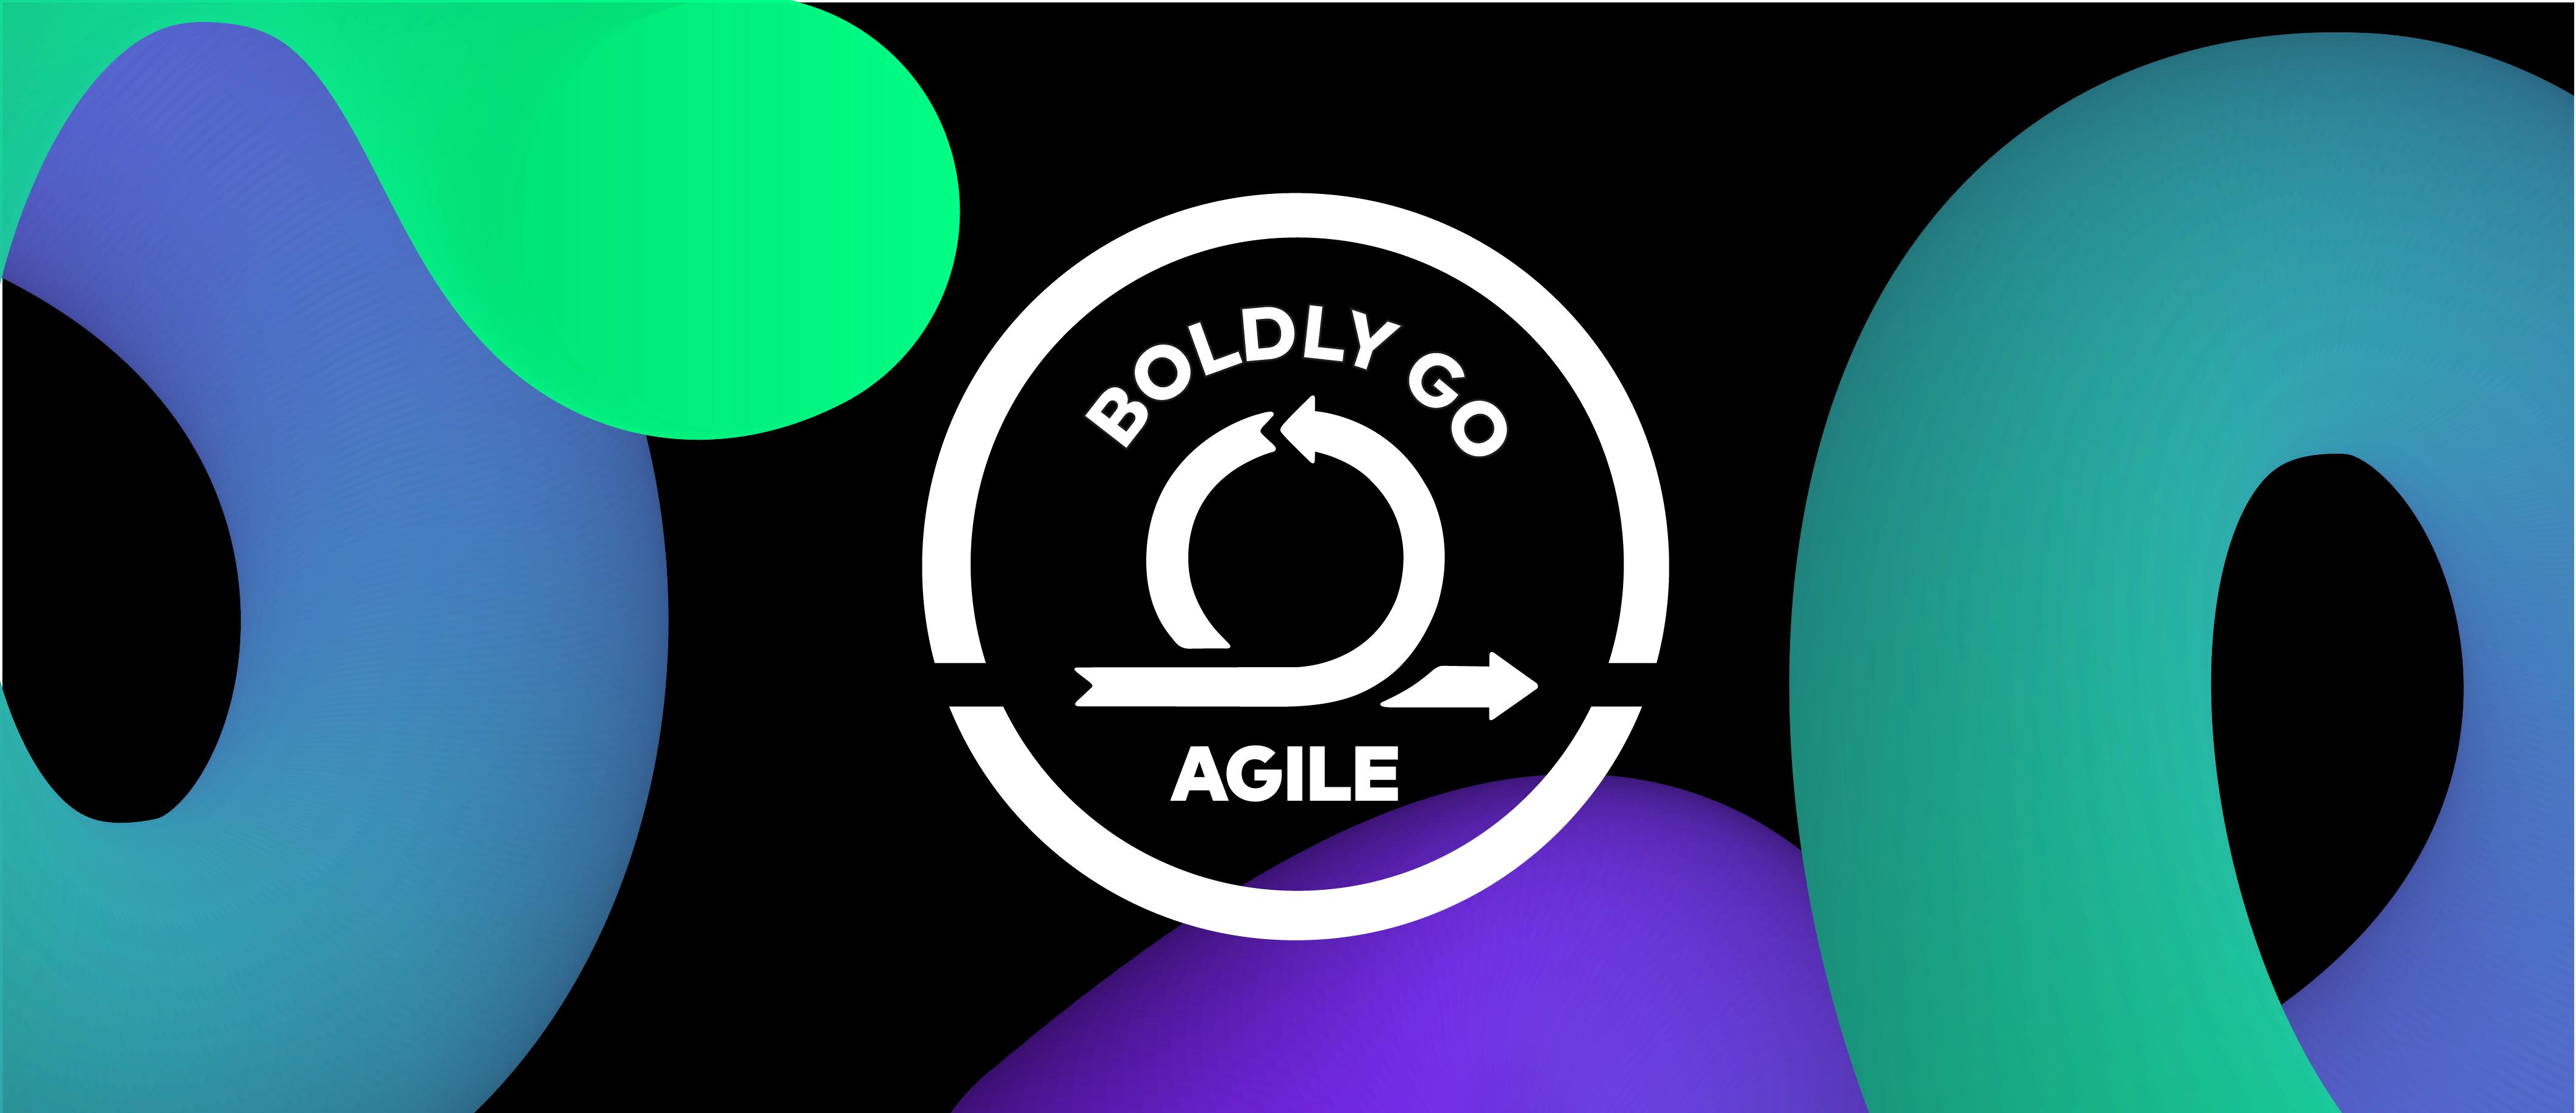 Boldly Go Industries, Agile Coaching, Agile Training, Agiles Arbeiten, Consulting, Frankfurt